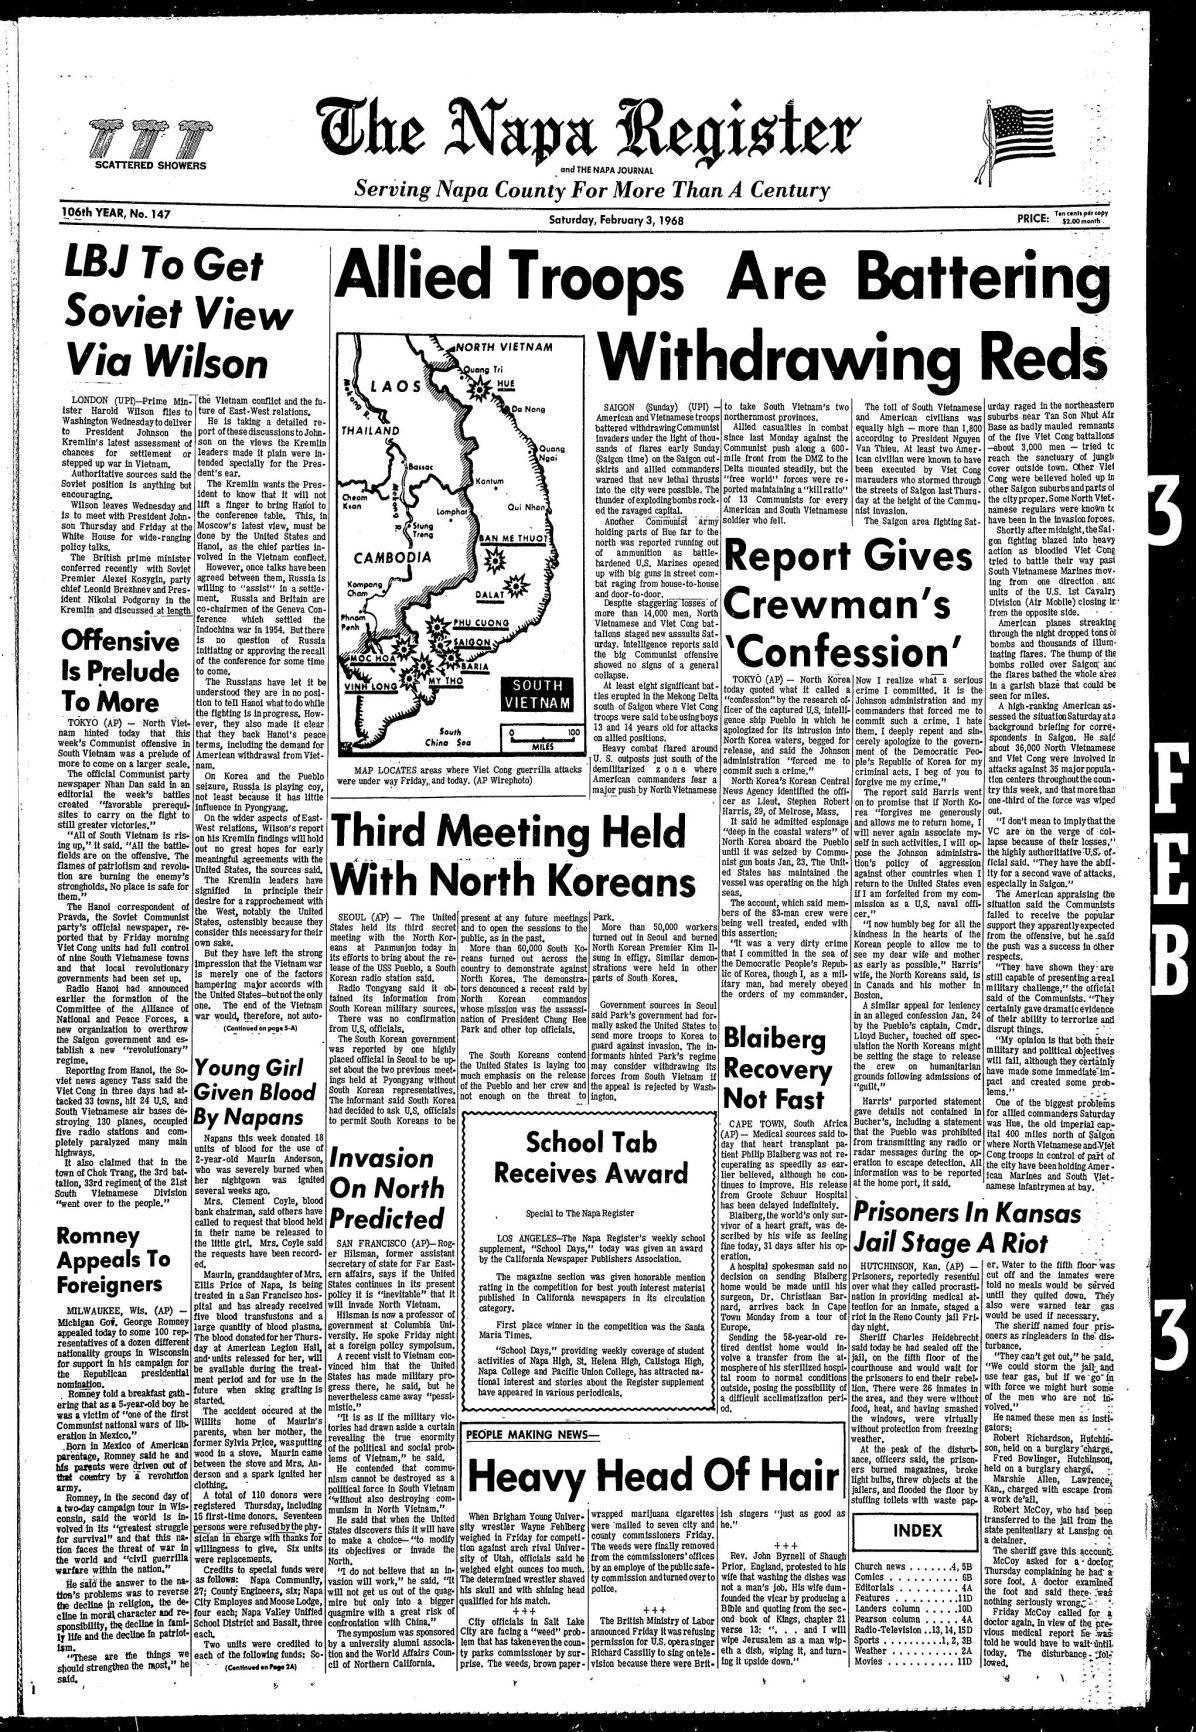 Feb. 3, 1968